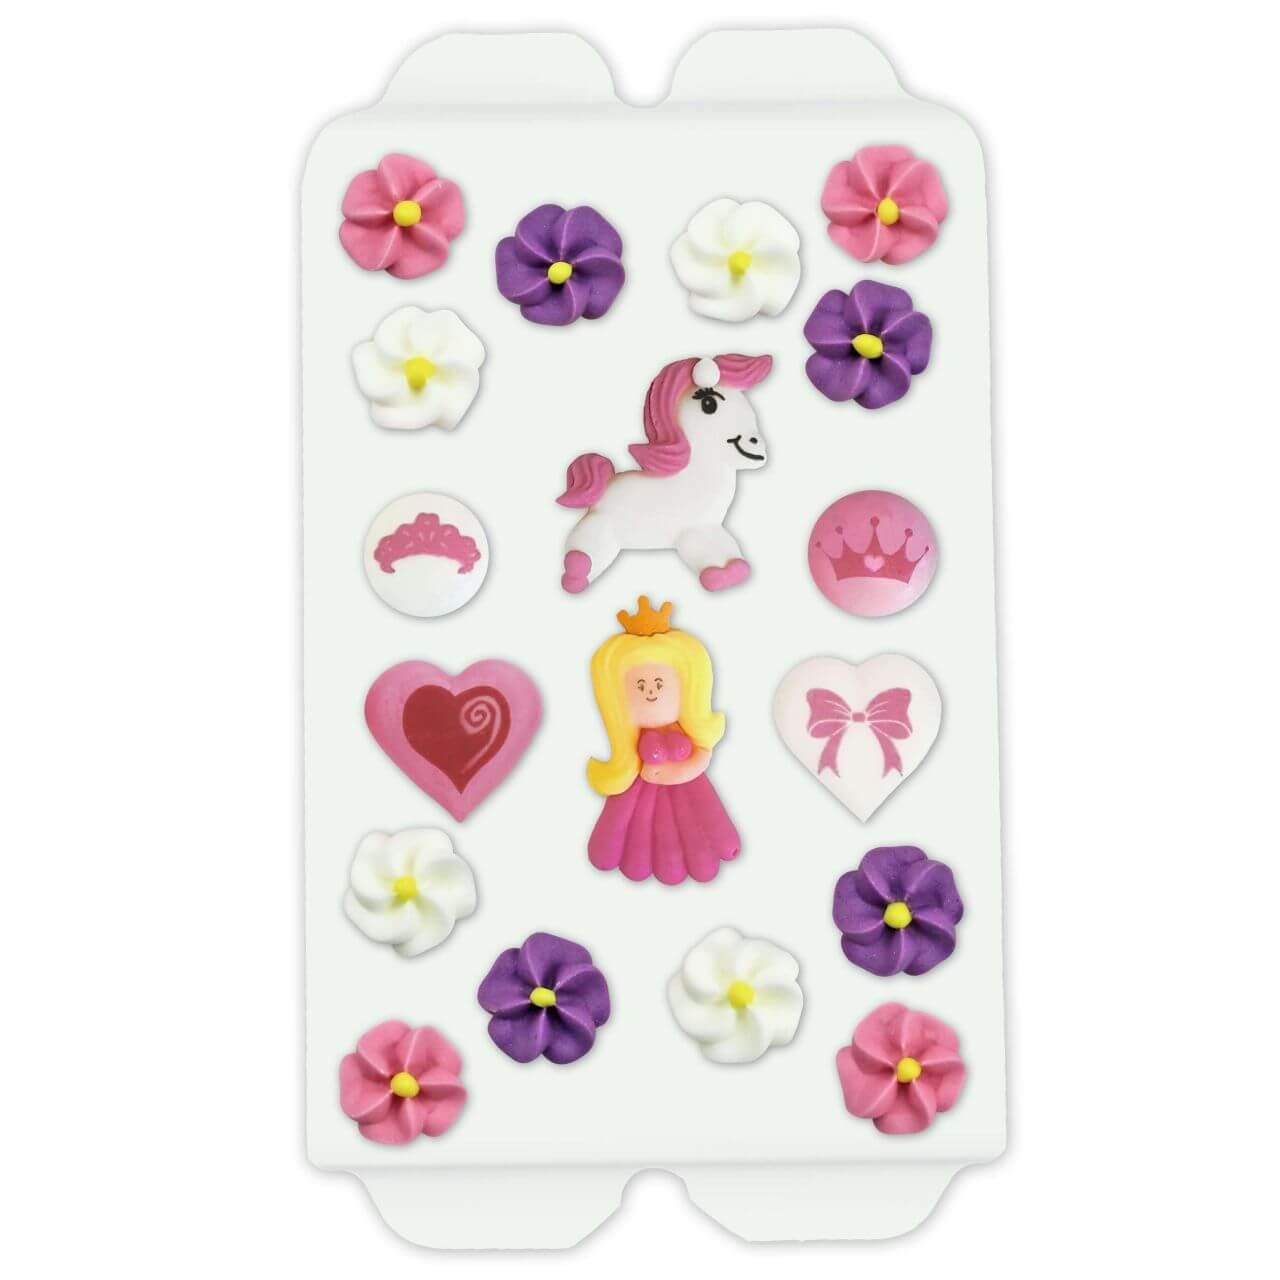 Cake decoration princess set, 16 pieces